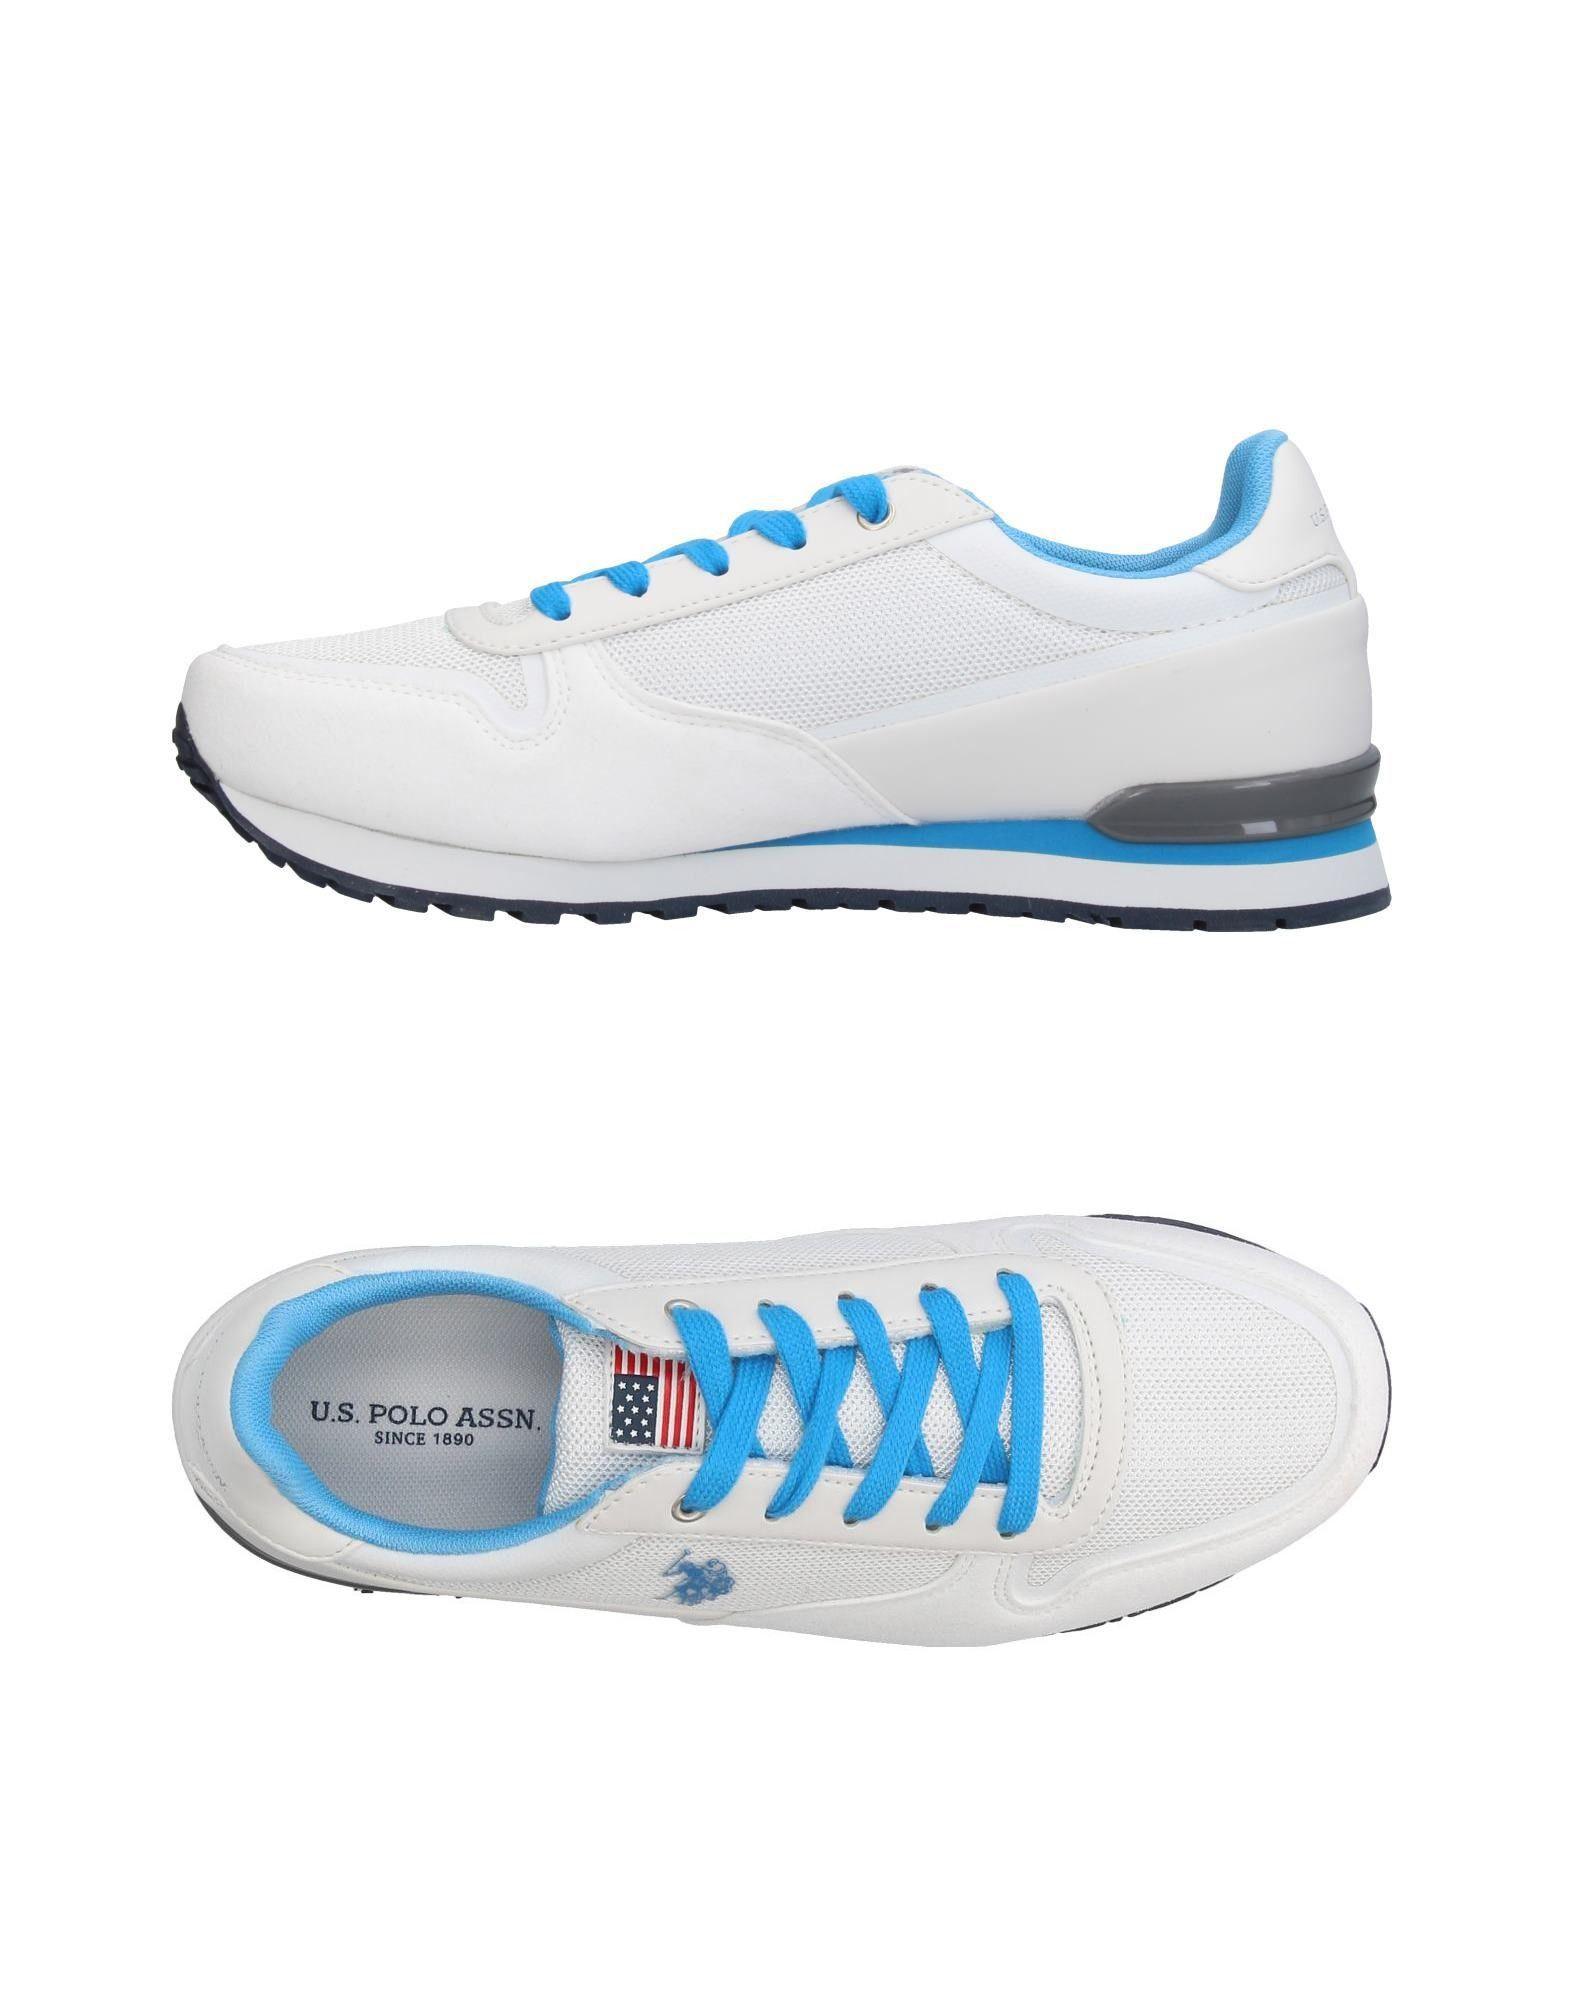 U.S.POLO ASSN. - Sneakers